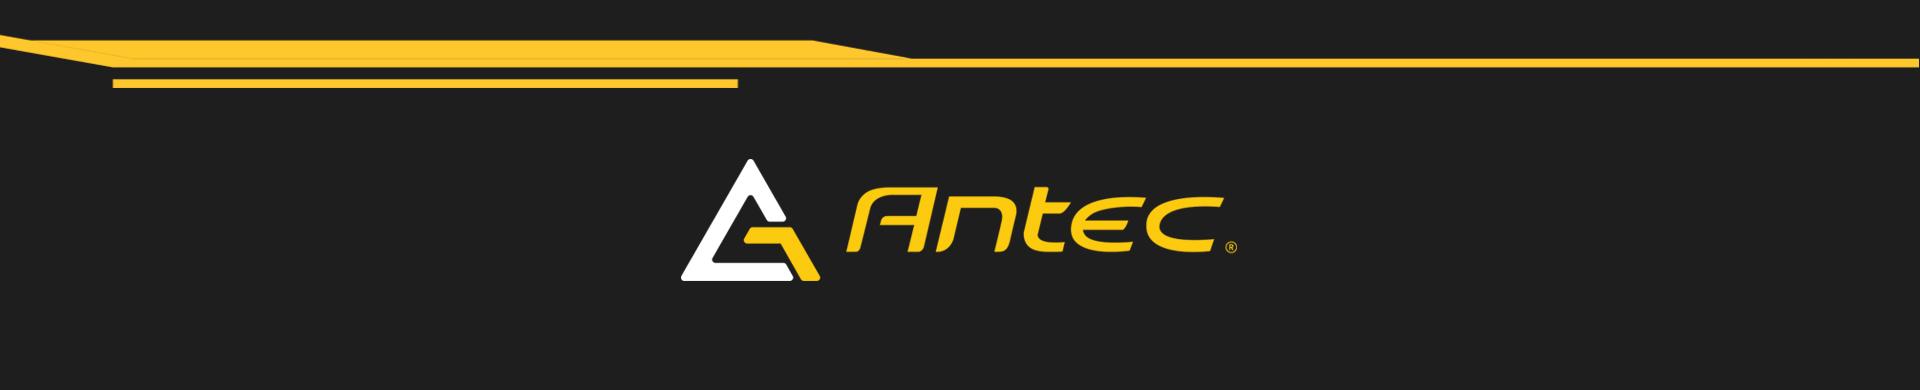 Antec Logo Bar